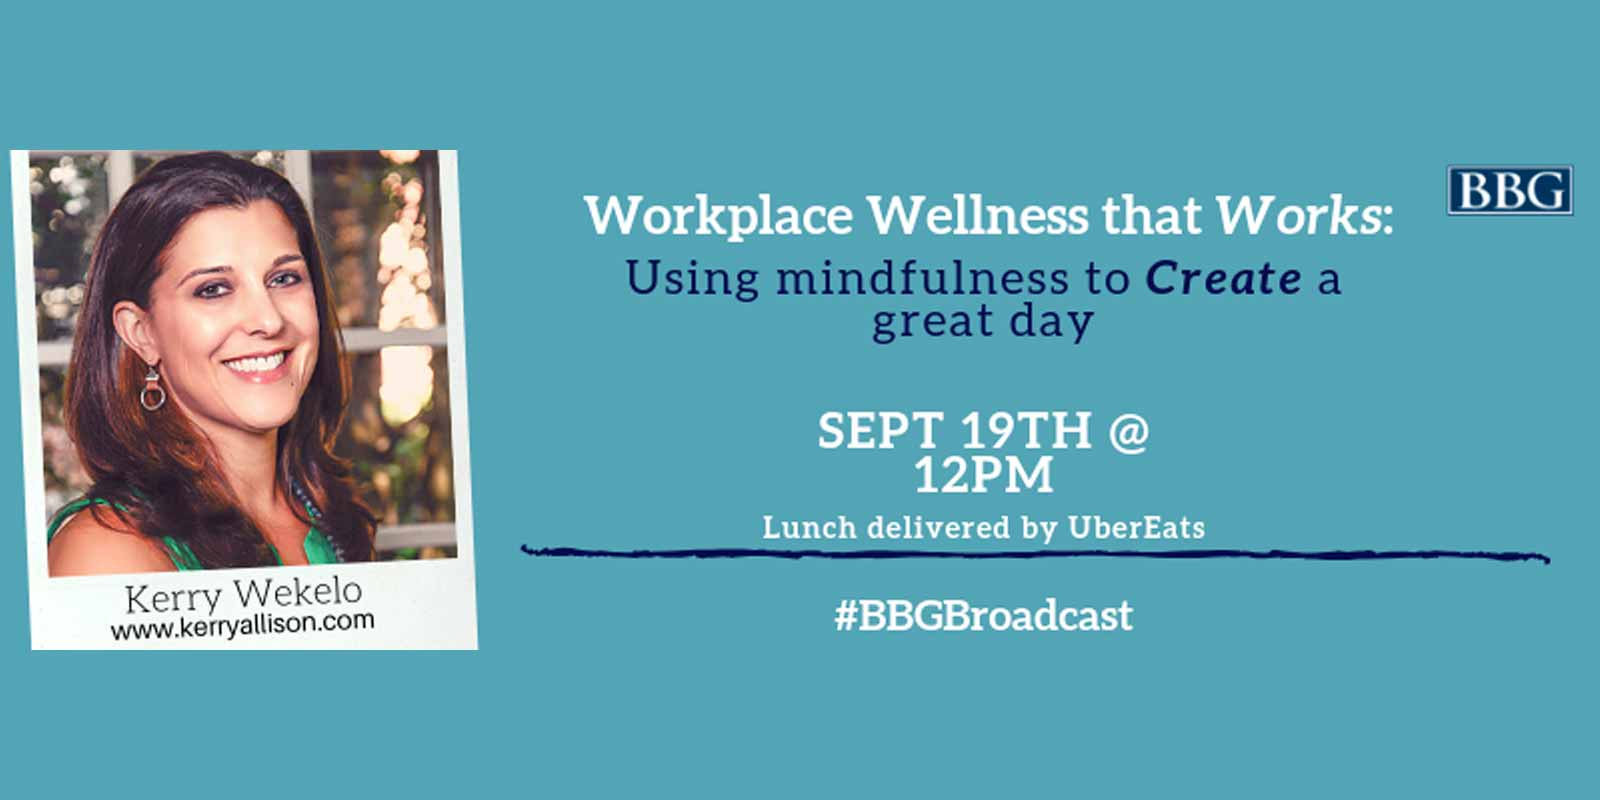 BBG Workplace Wellness Webinar Banner